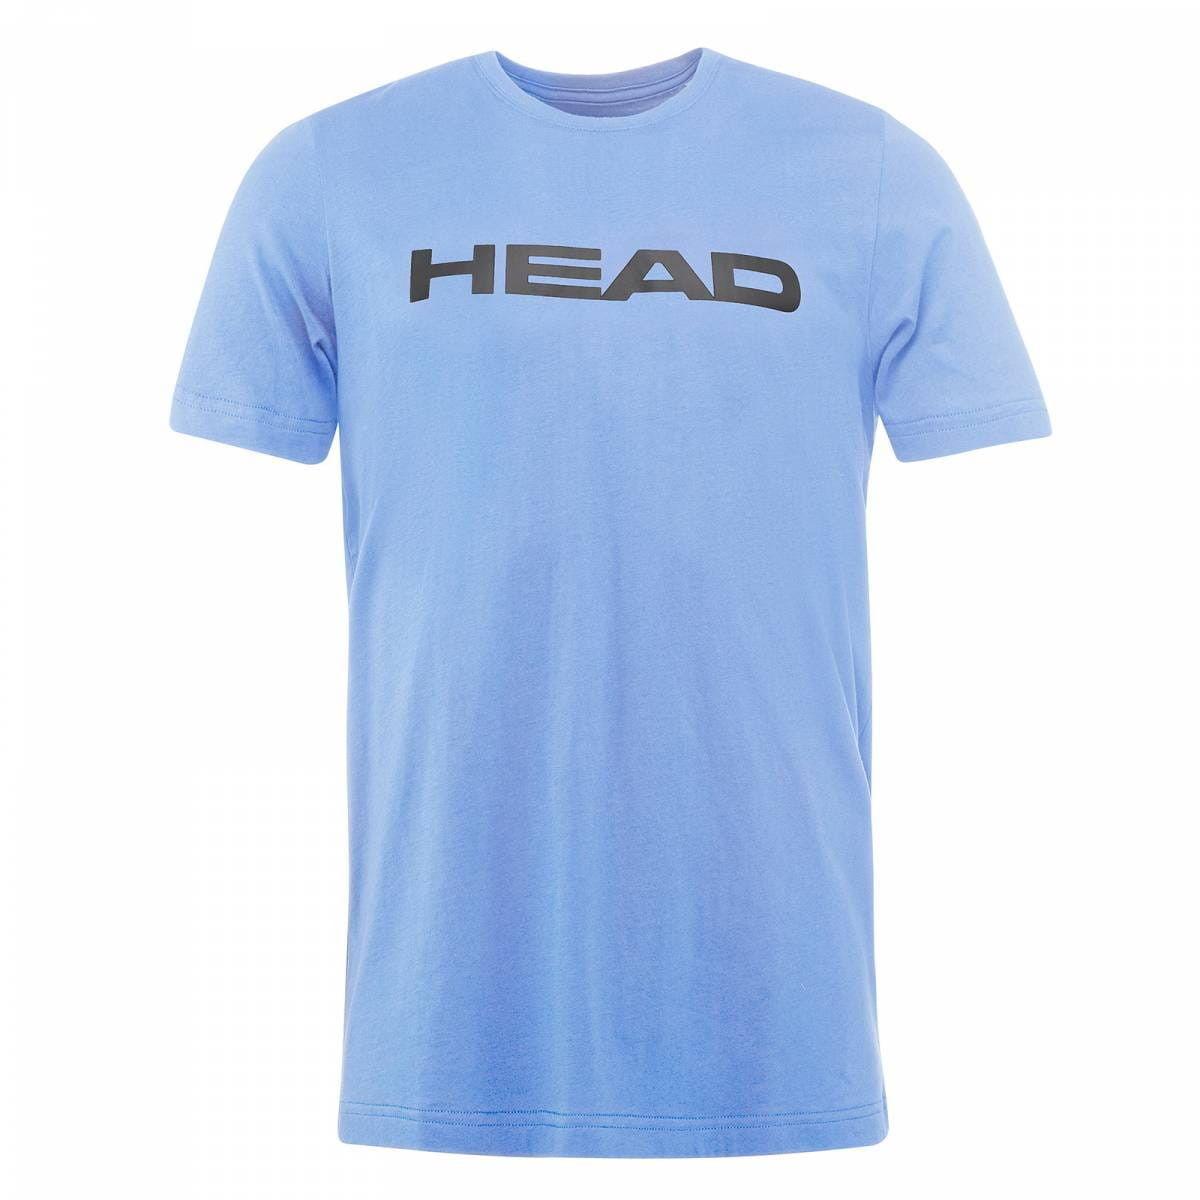 Head Ivan T-Shirt Jr - sky blue/anthracite